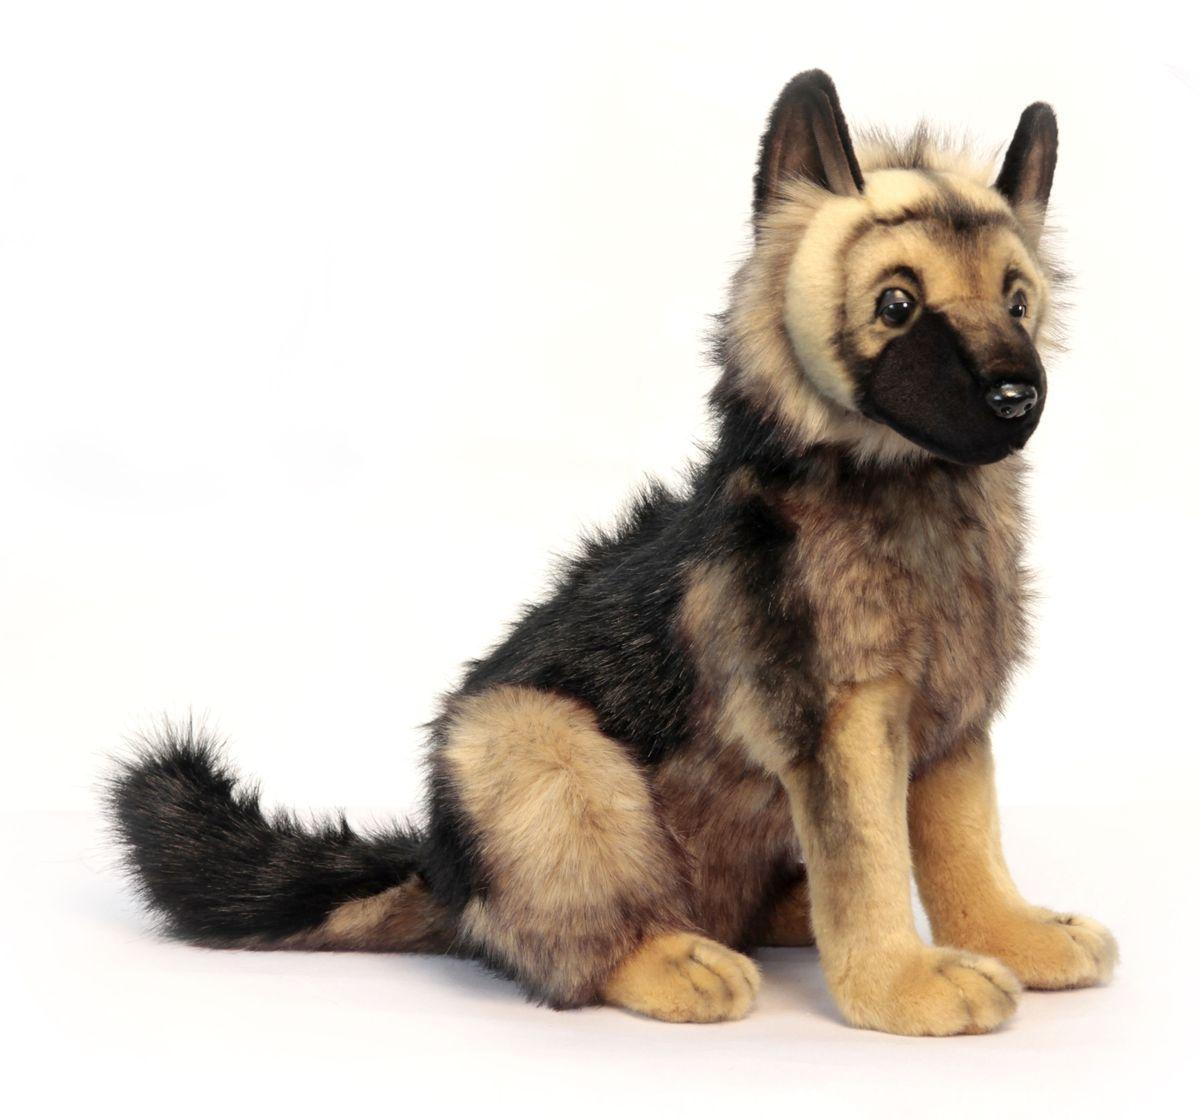 Hansa Мягкая игрушка Щенок немецкой овчарки 41 см hansa мягкая игрушка щенок немецкой овчарки